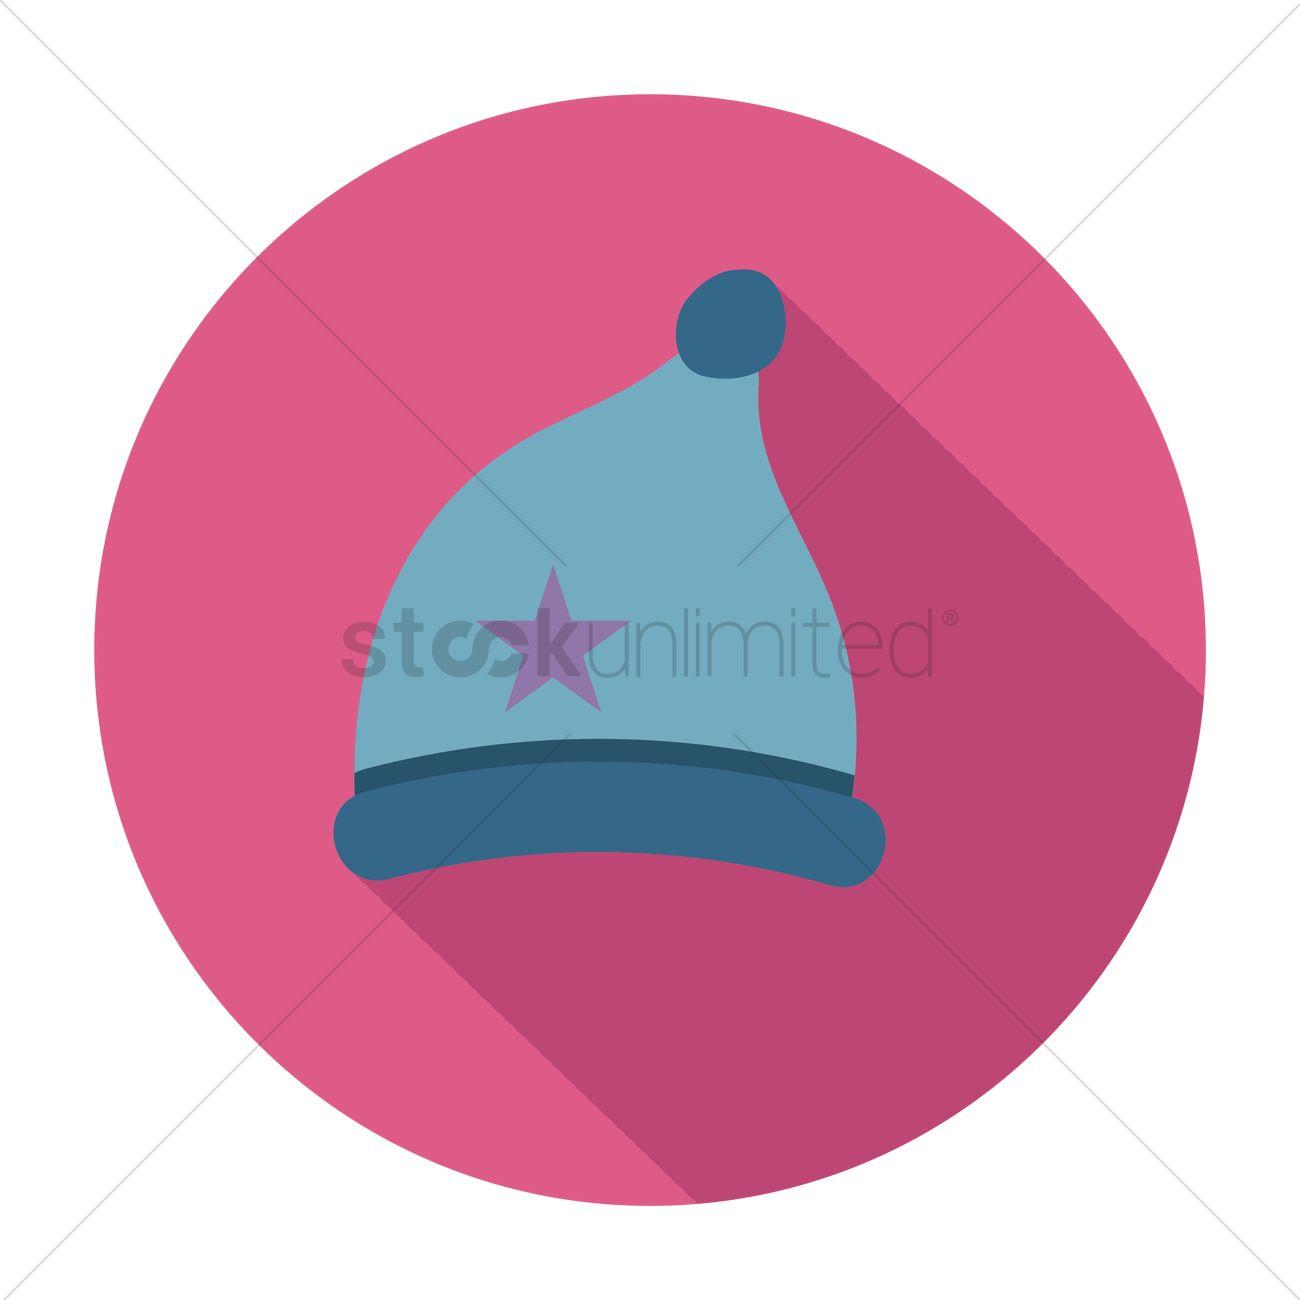 free baby cap vector image 1270255 stockunlimited rh stockunlimited com Baseball Hat Vector Winter Hat Vector